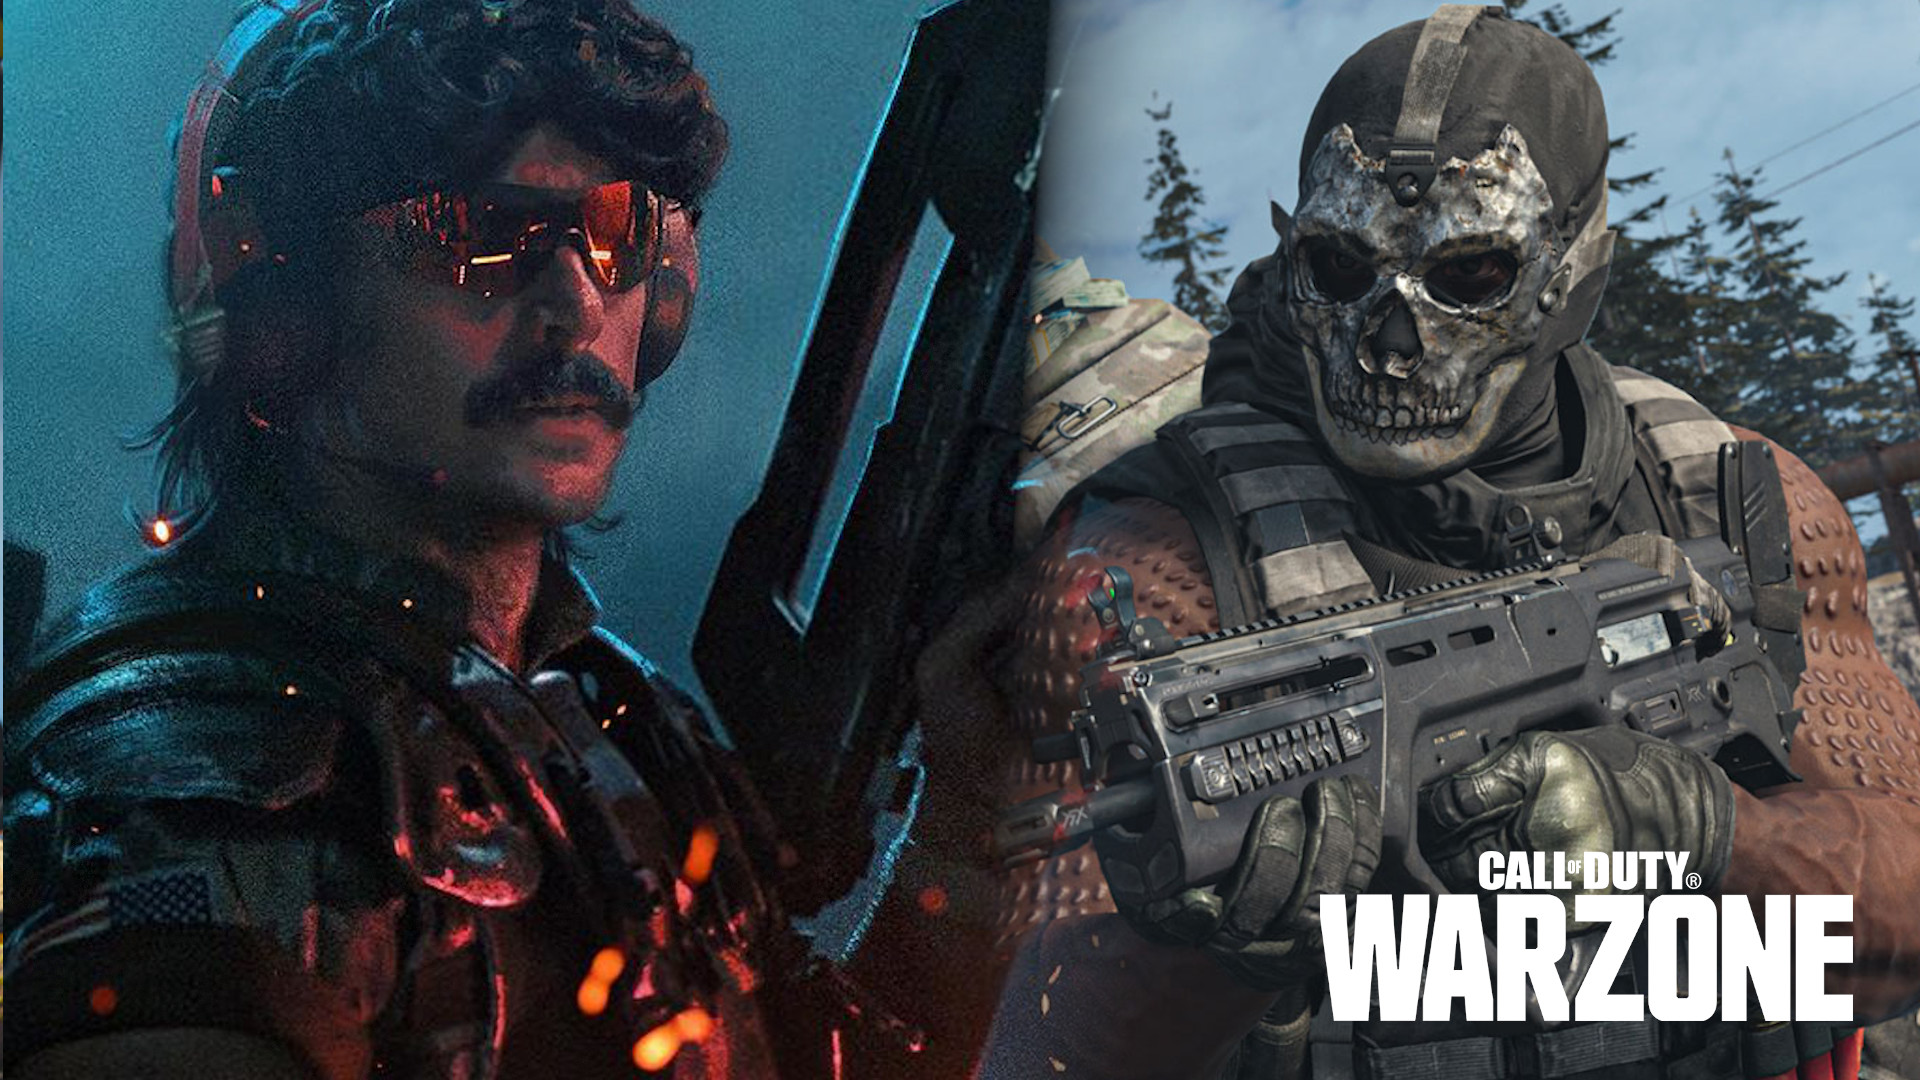 dr disrespect vs warzone tournament